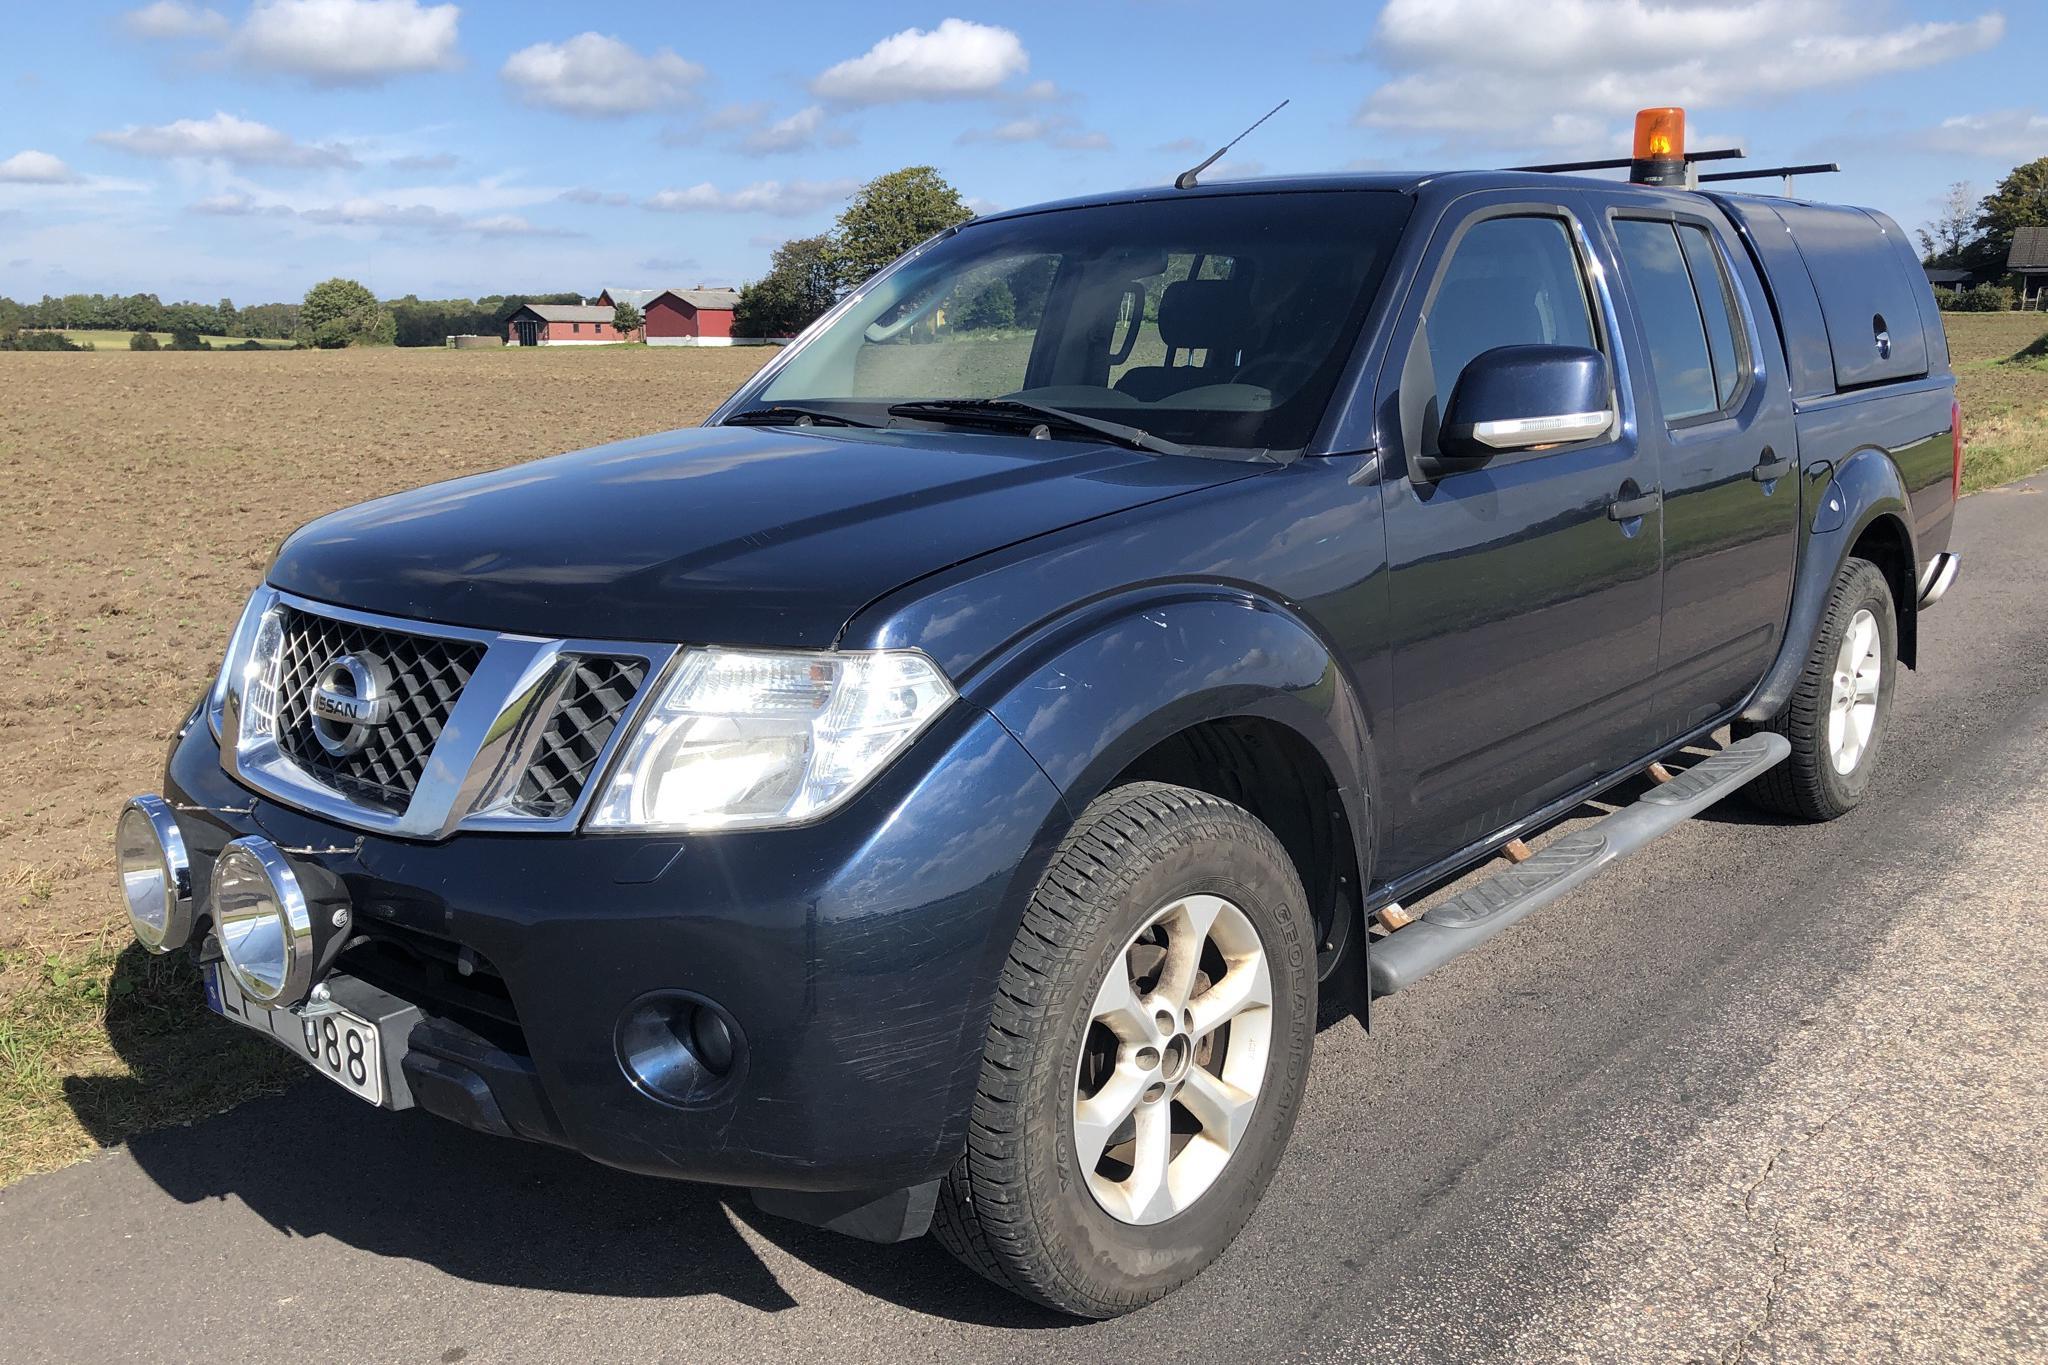 Nissan Navara 2.5 dCi (190hk) - 21 478 mil - Automat - Dark Blue - 2011